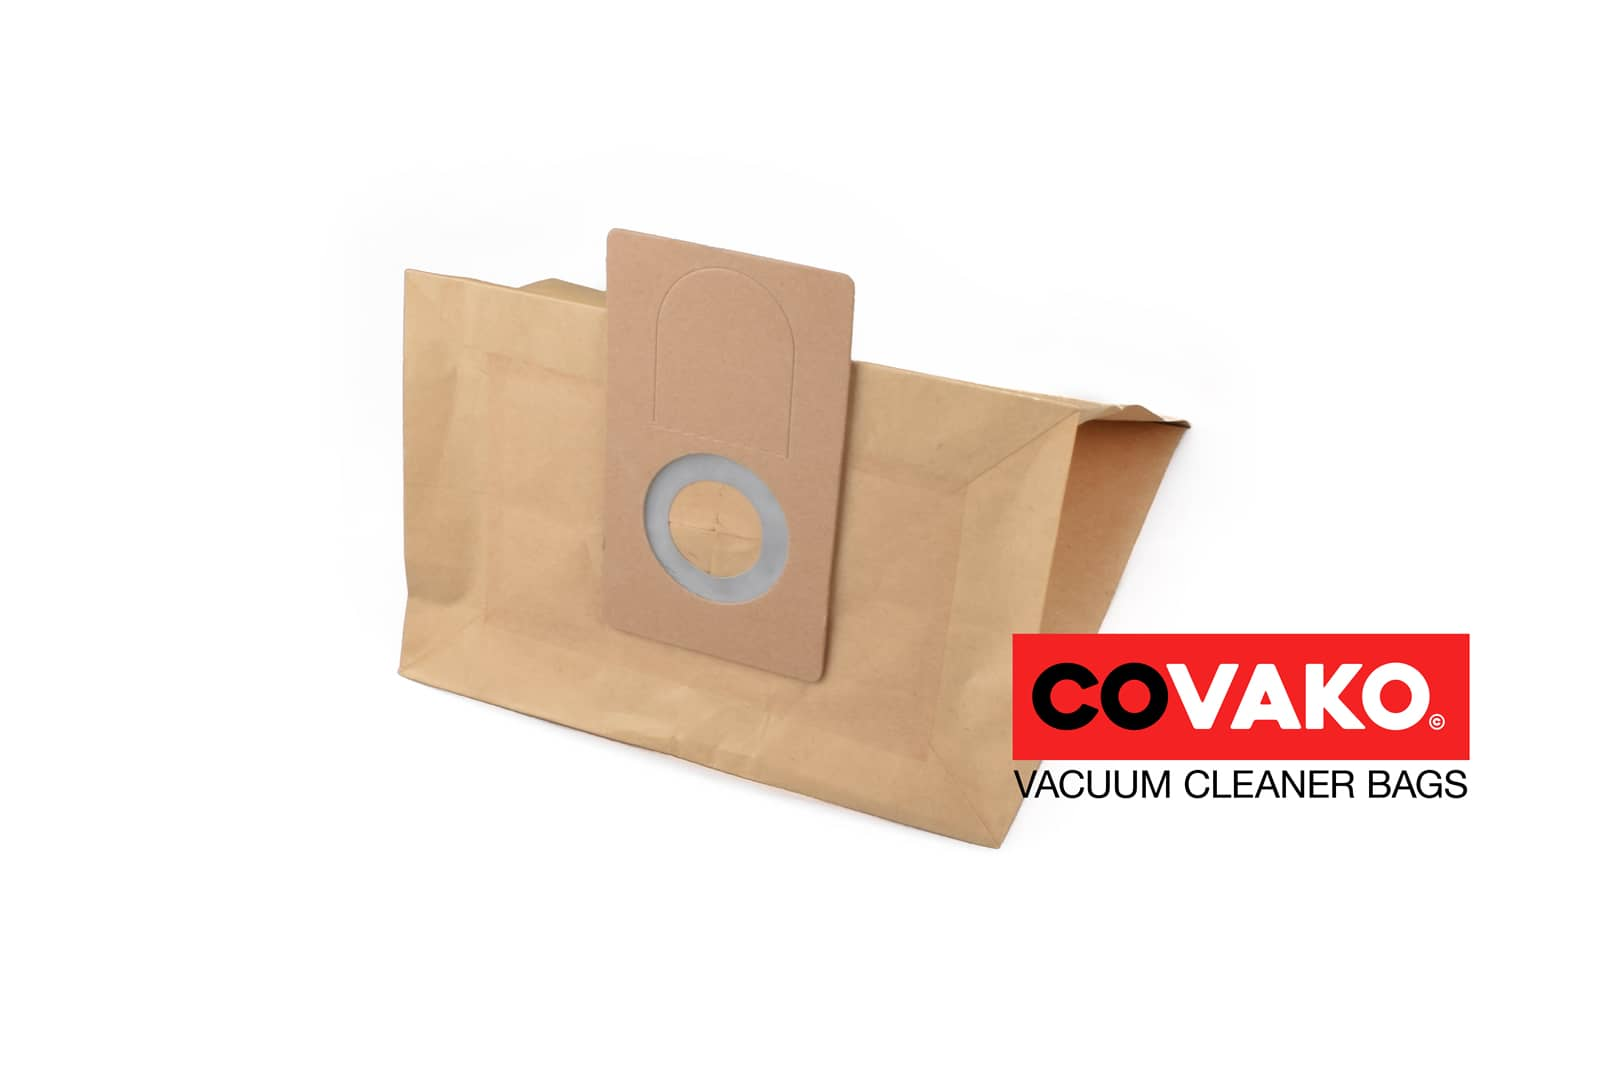 Fast Major / Paper - Fast vacuum cleaner bags